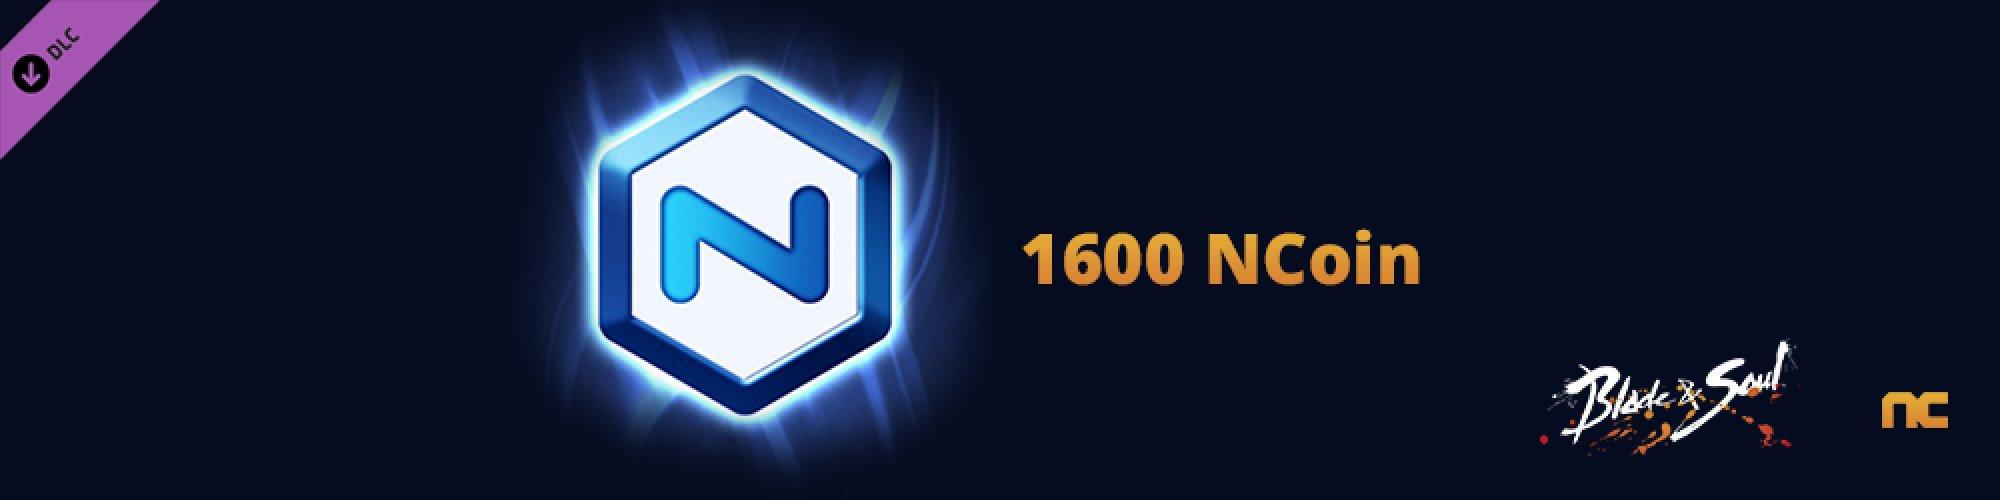 NCoin 1600 banner